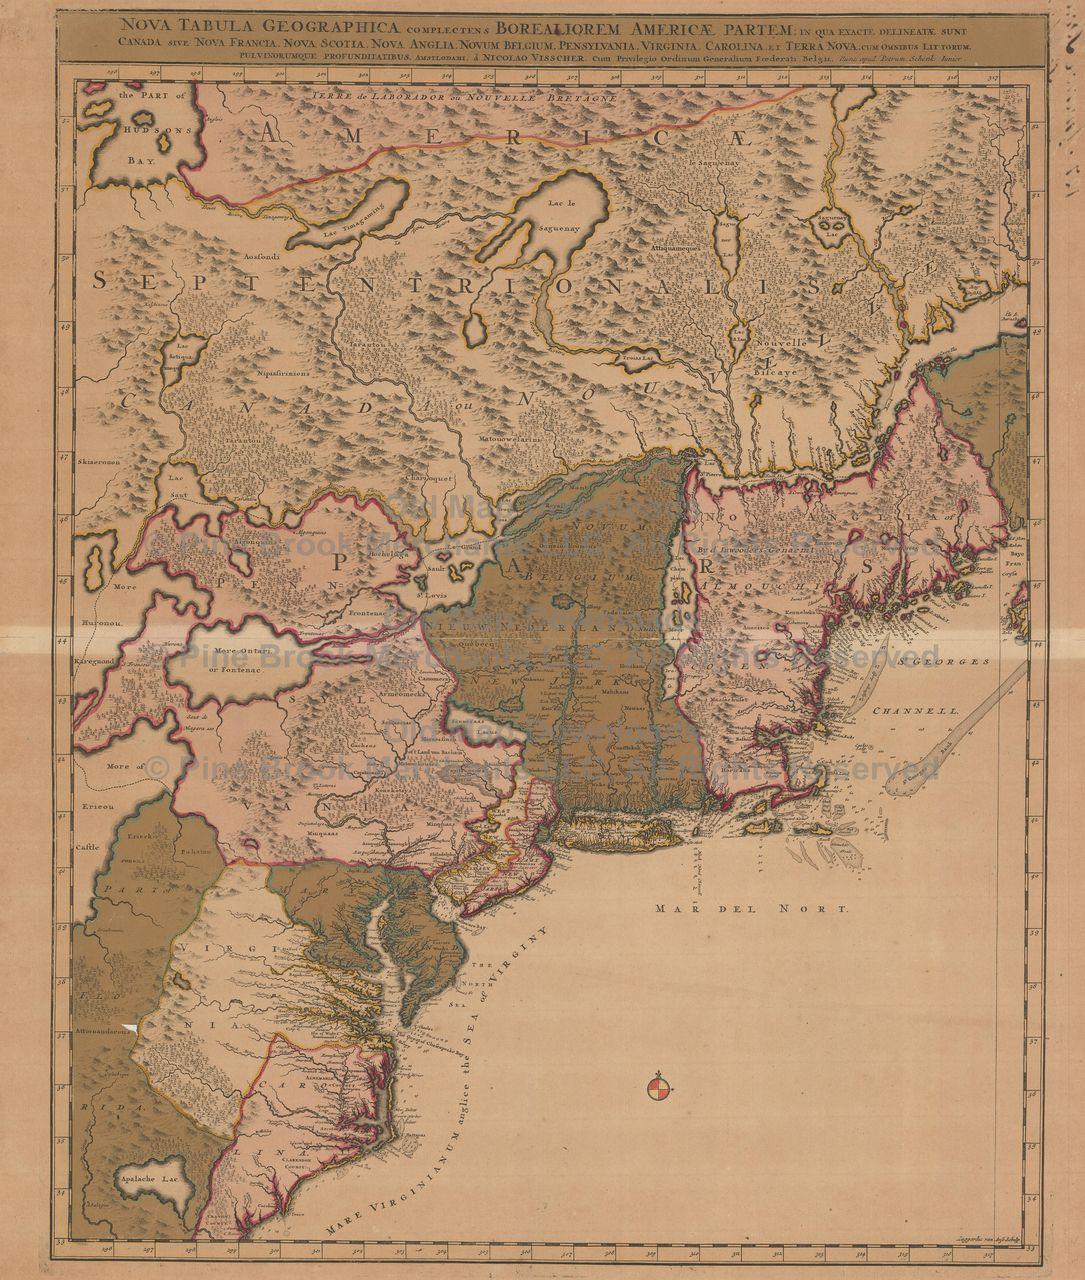 United States Old Map Schenk 1715 Digital Image Scan Download